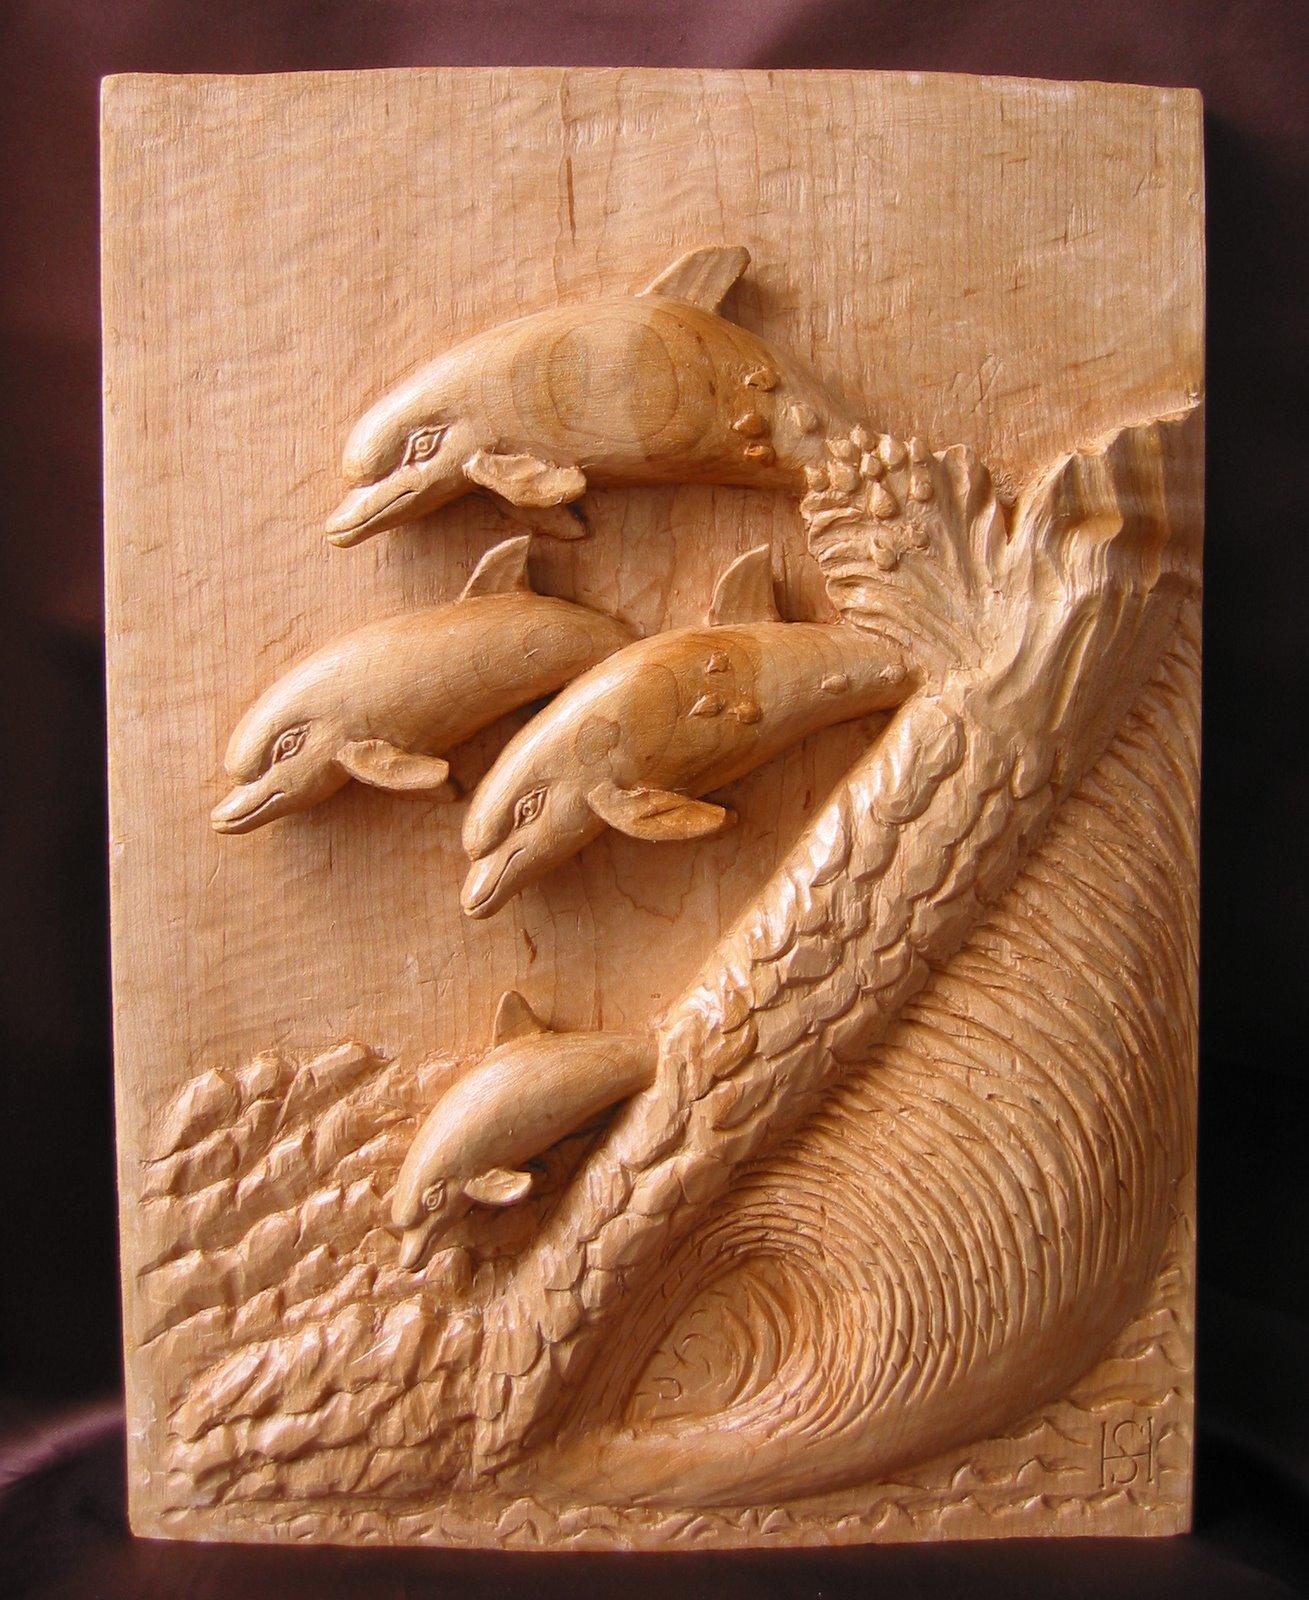 Delfines talla en madera wood carving esculturas - Fotos en madera ...